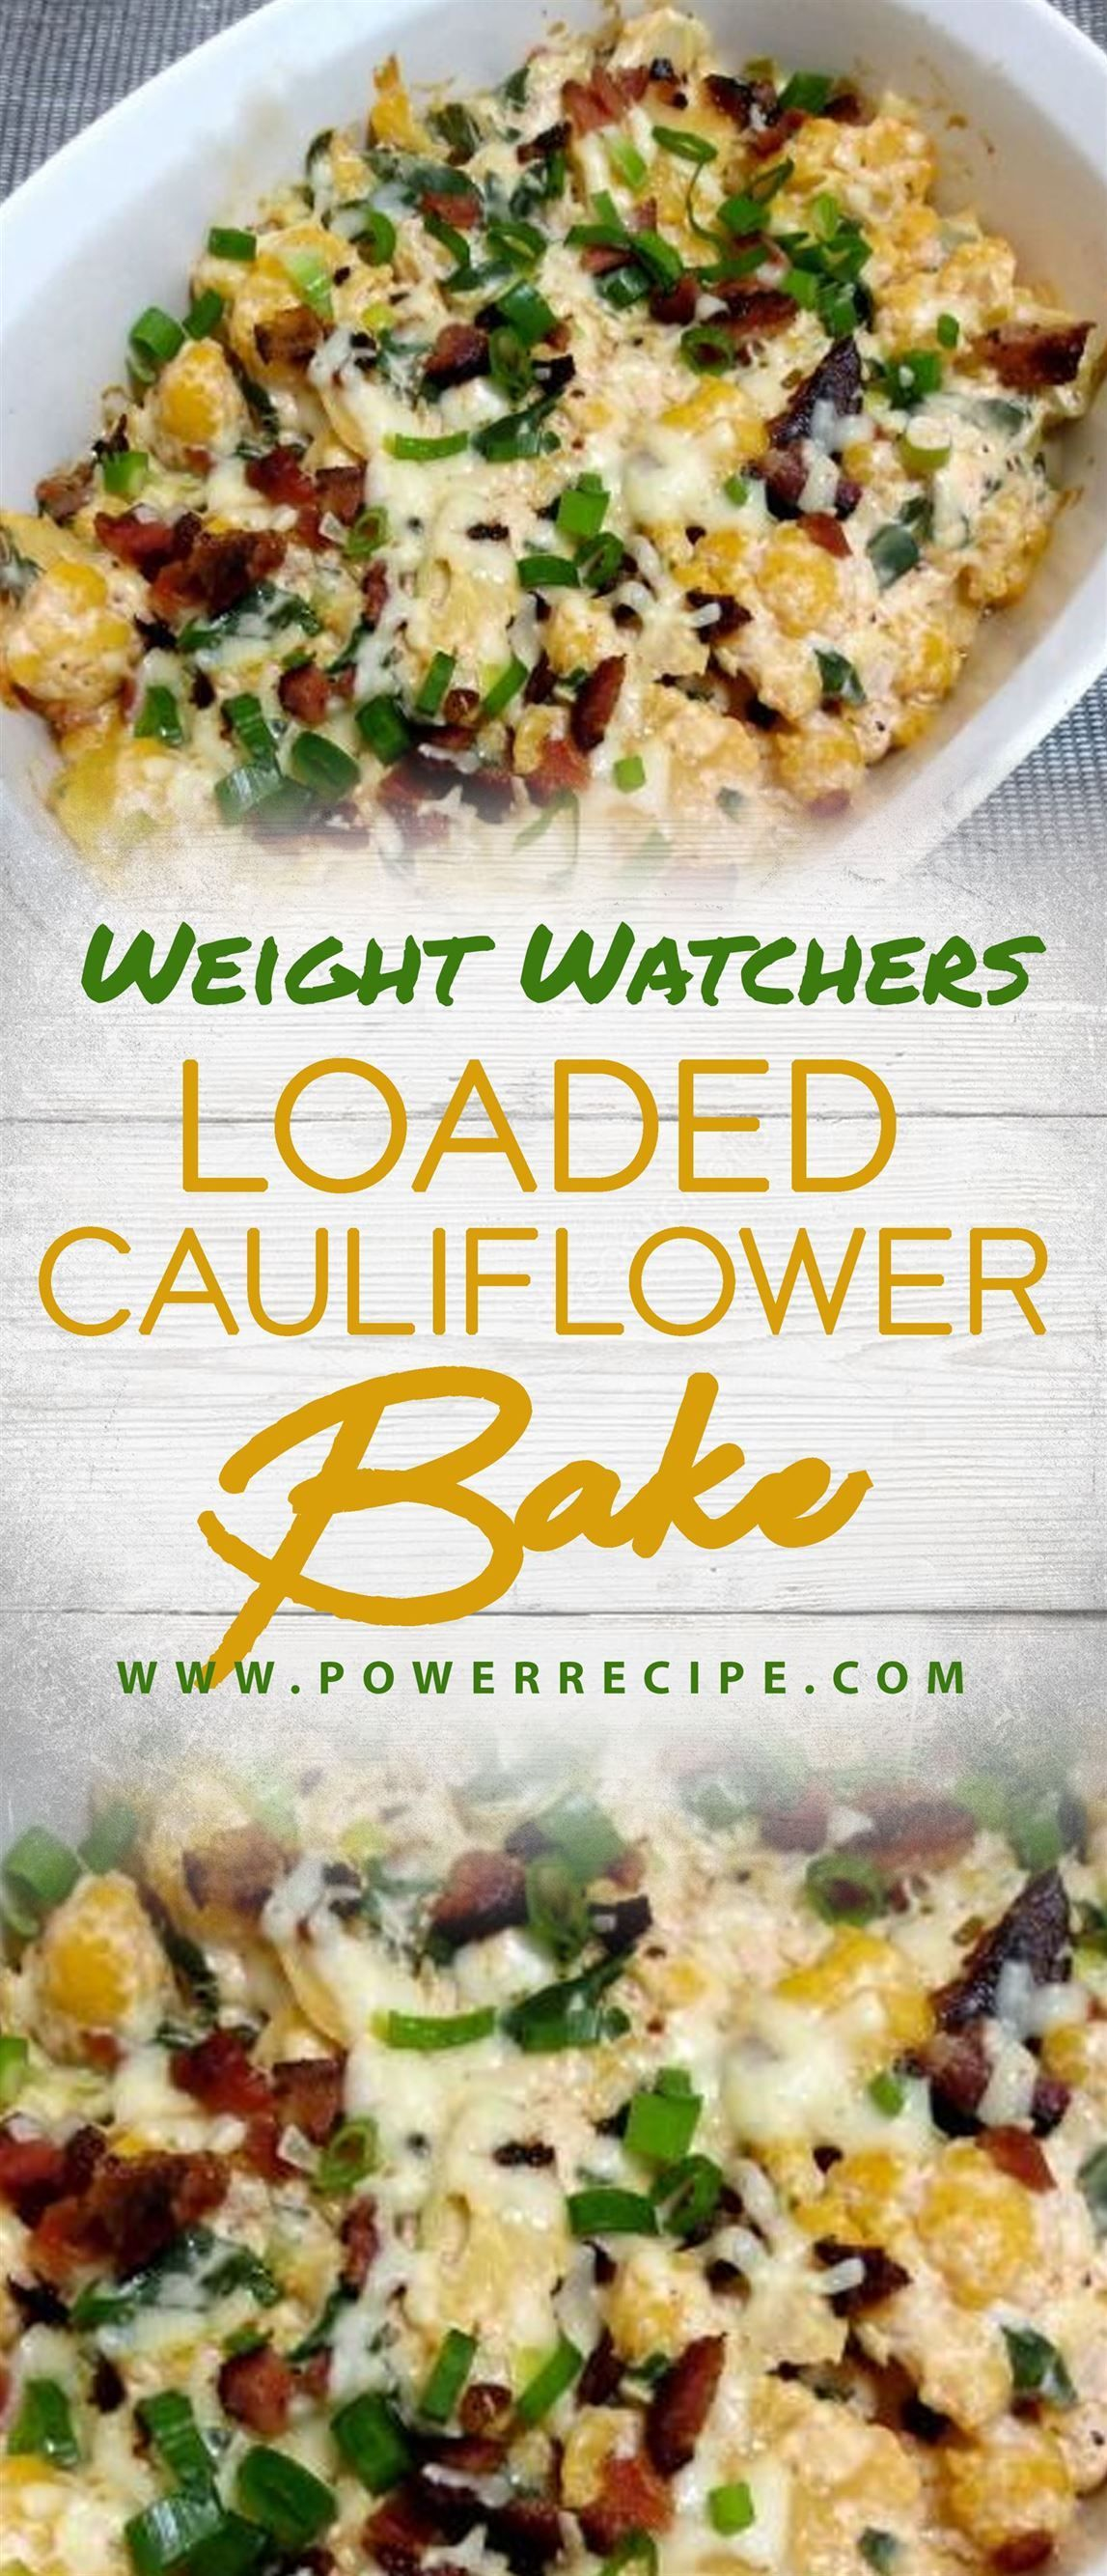 Weight Watchers Loaded Cauliflower Bake!!! - All about Your Power Recipes #loadedcauliflowerbake